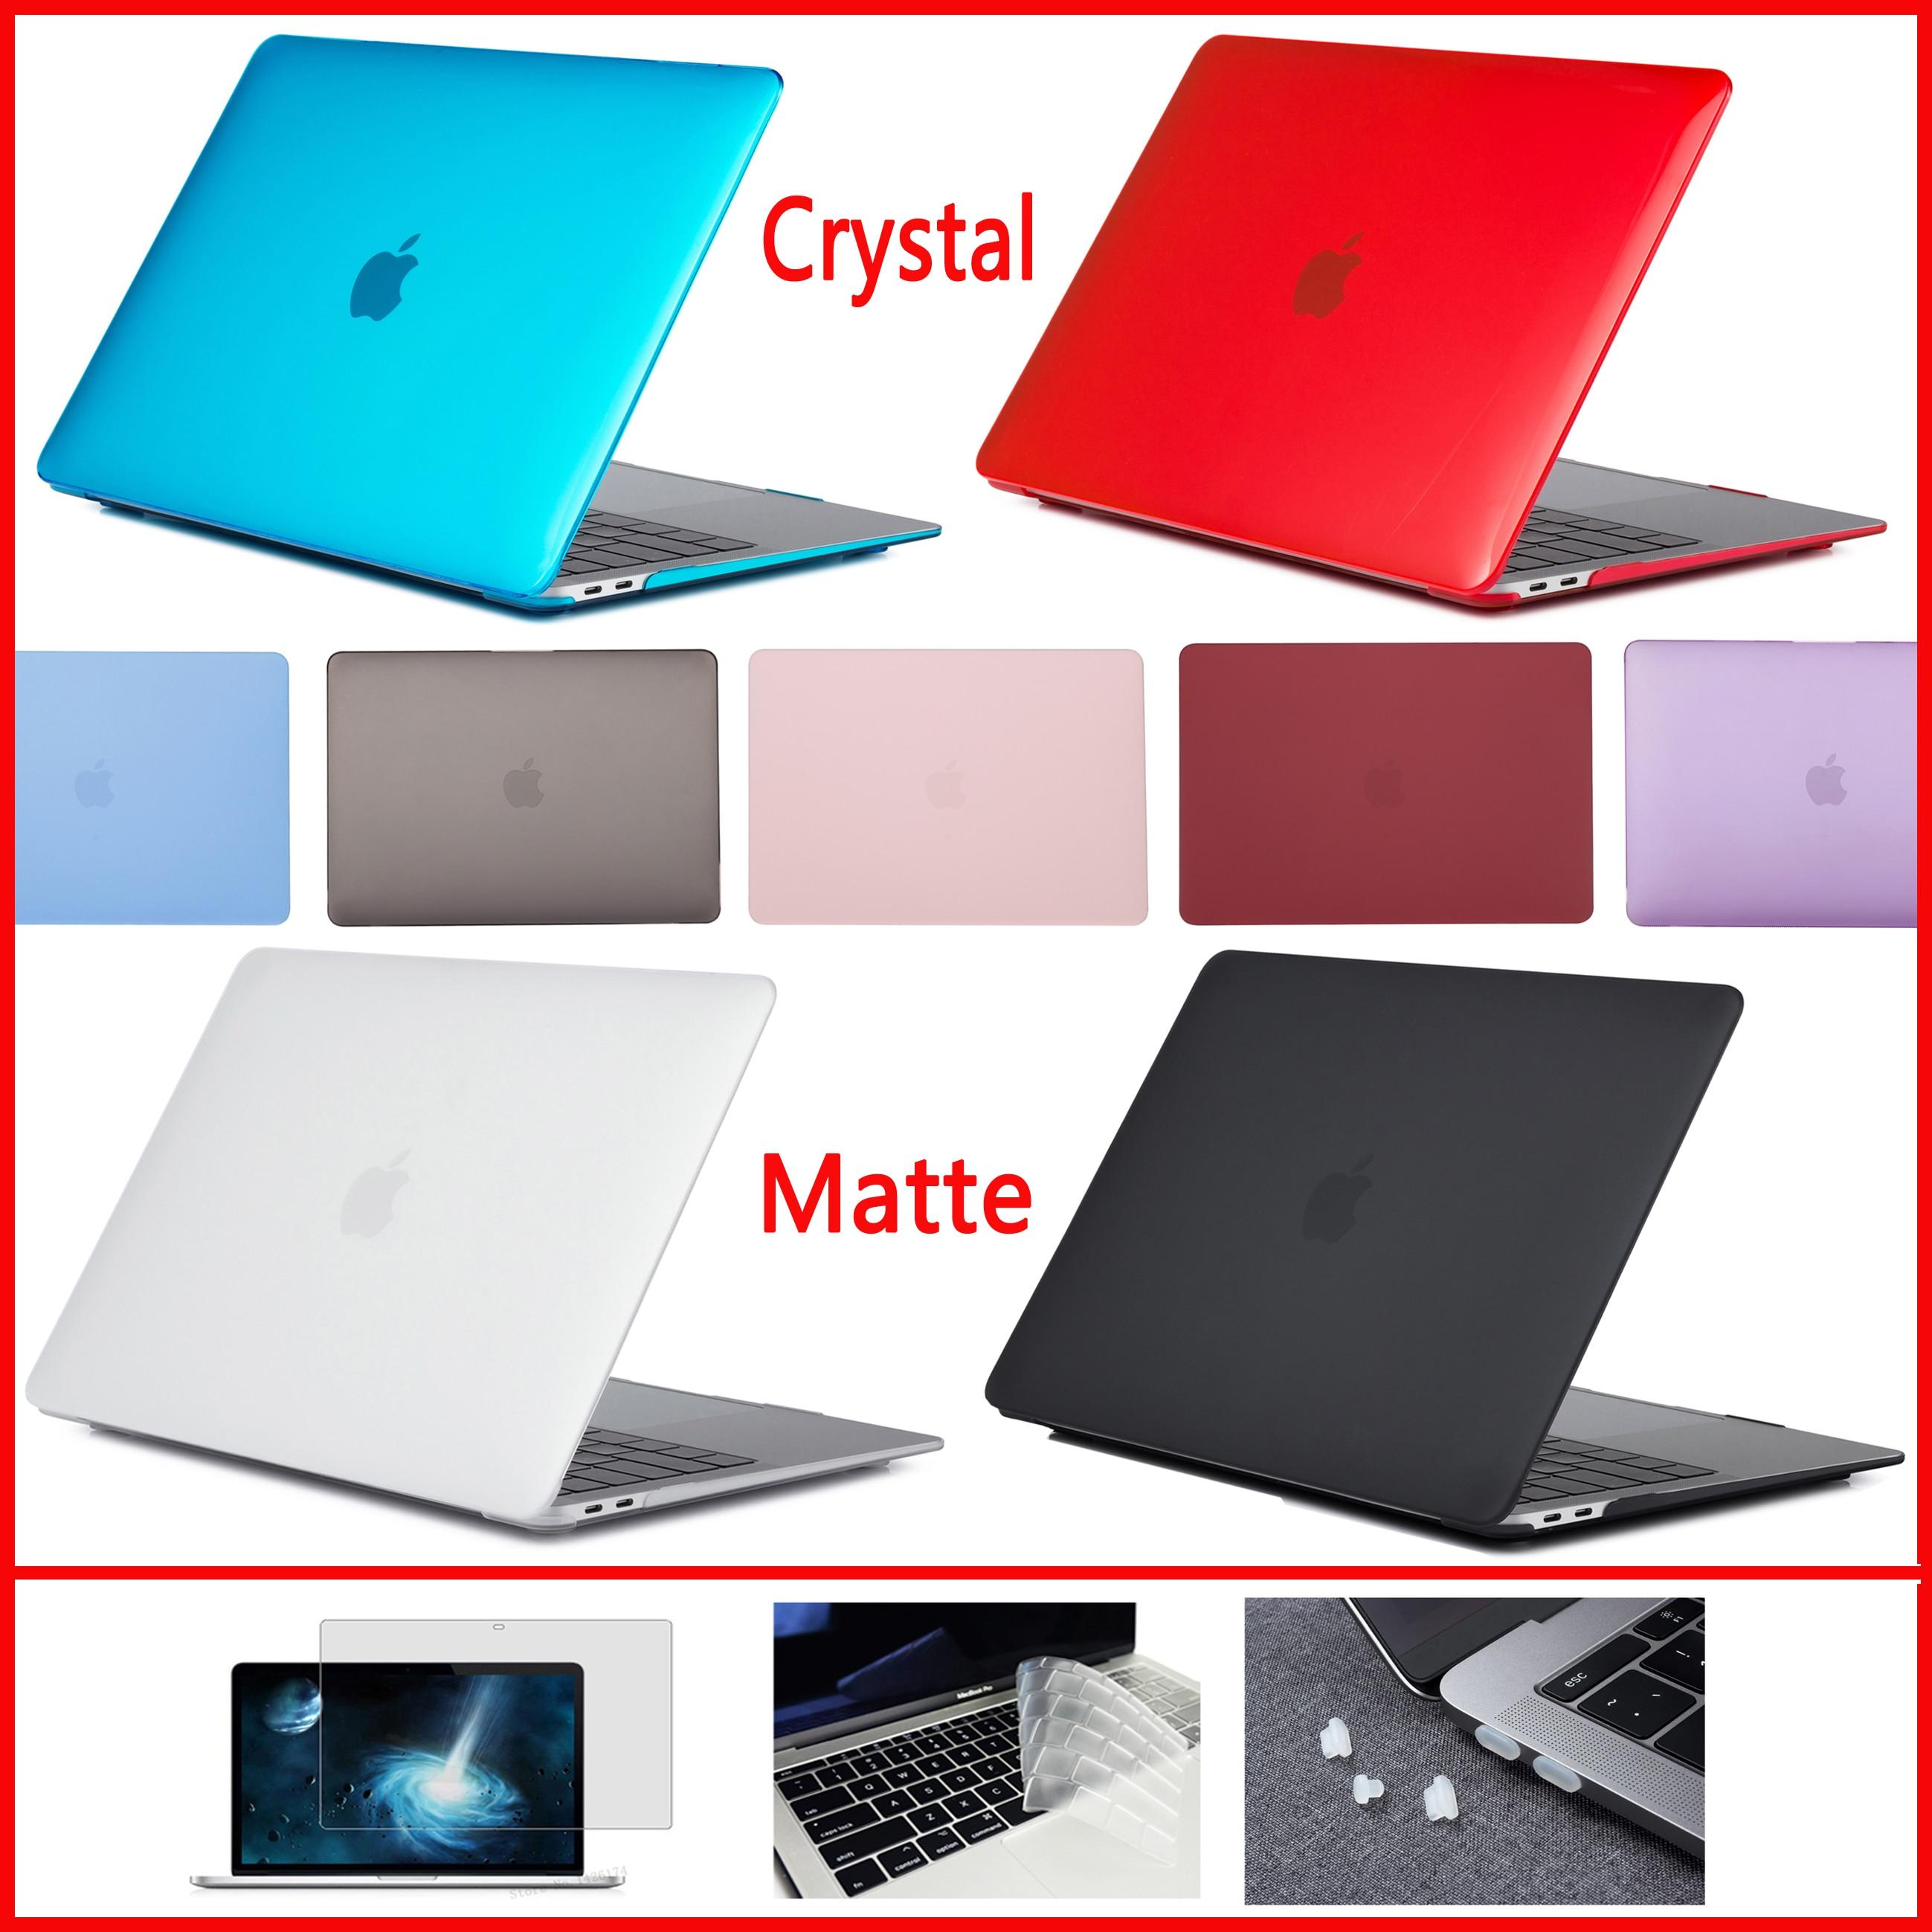 2020 Новый чехол для ноутбука Macbook Air 13 A1466 Touch bar/ID A1932 A2179, Air pro retina 11 12 13,3 15 16 дюймов A1706 A2159 A2251